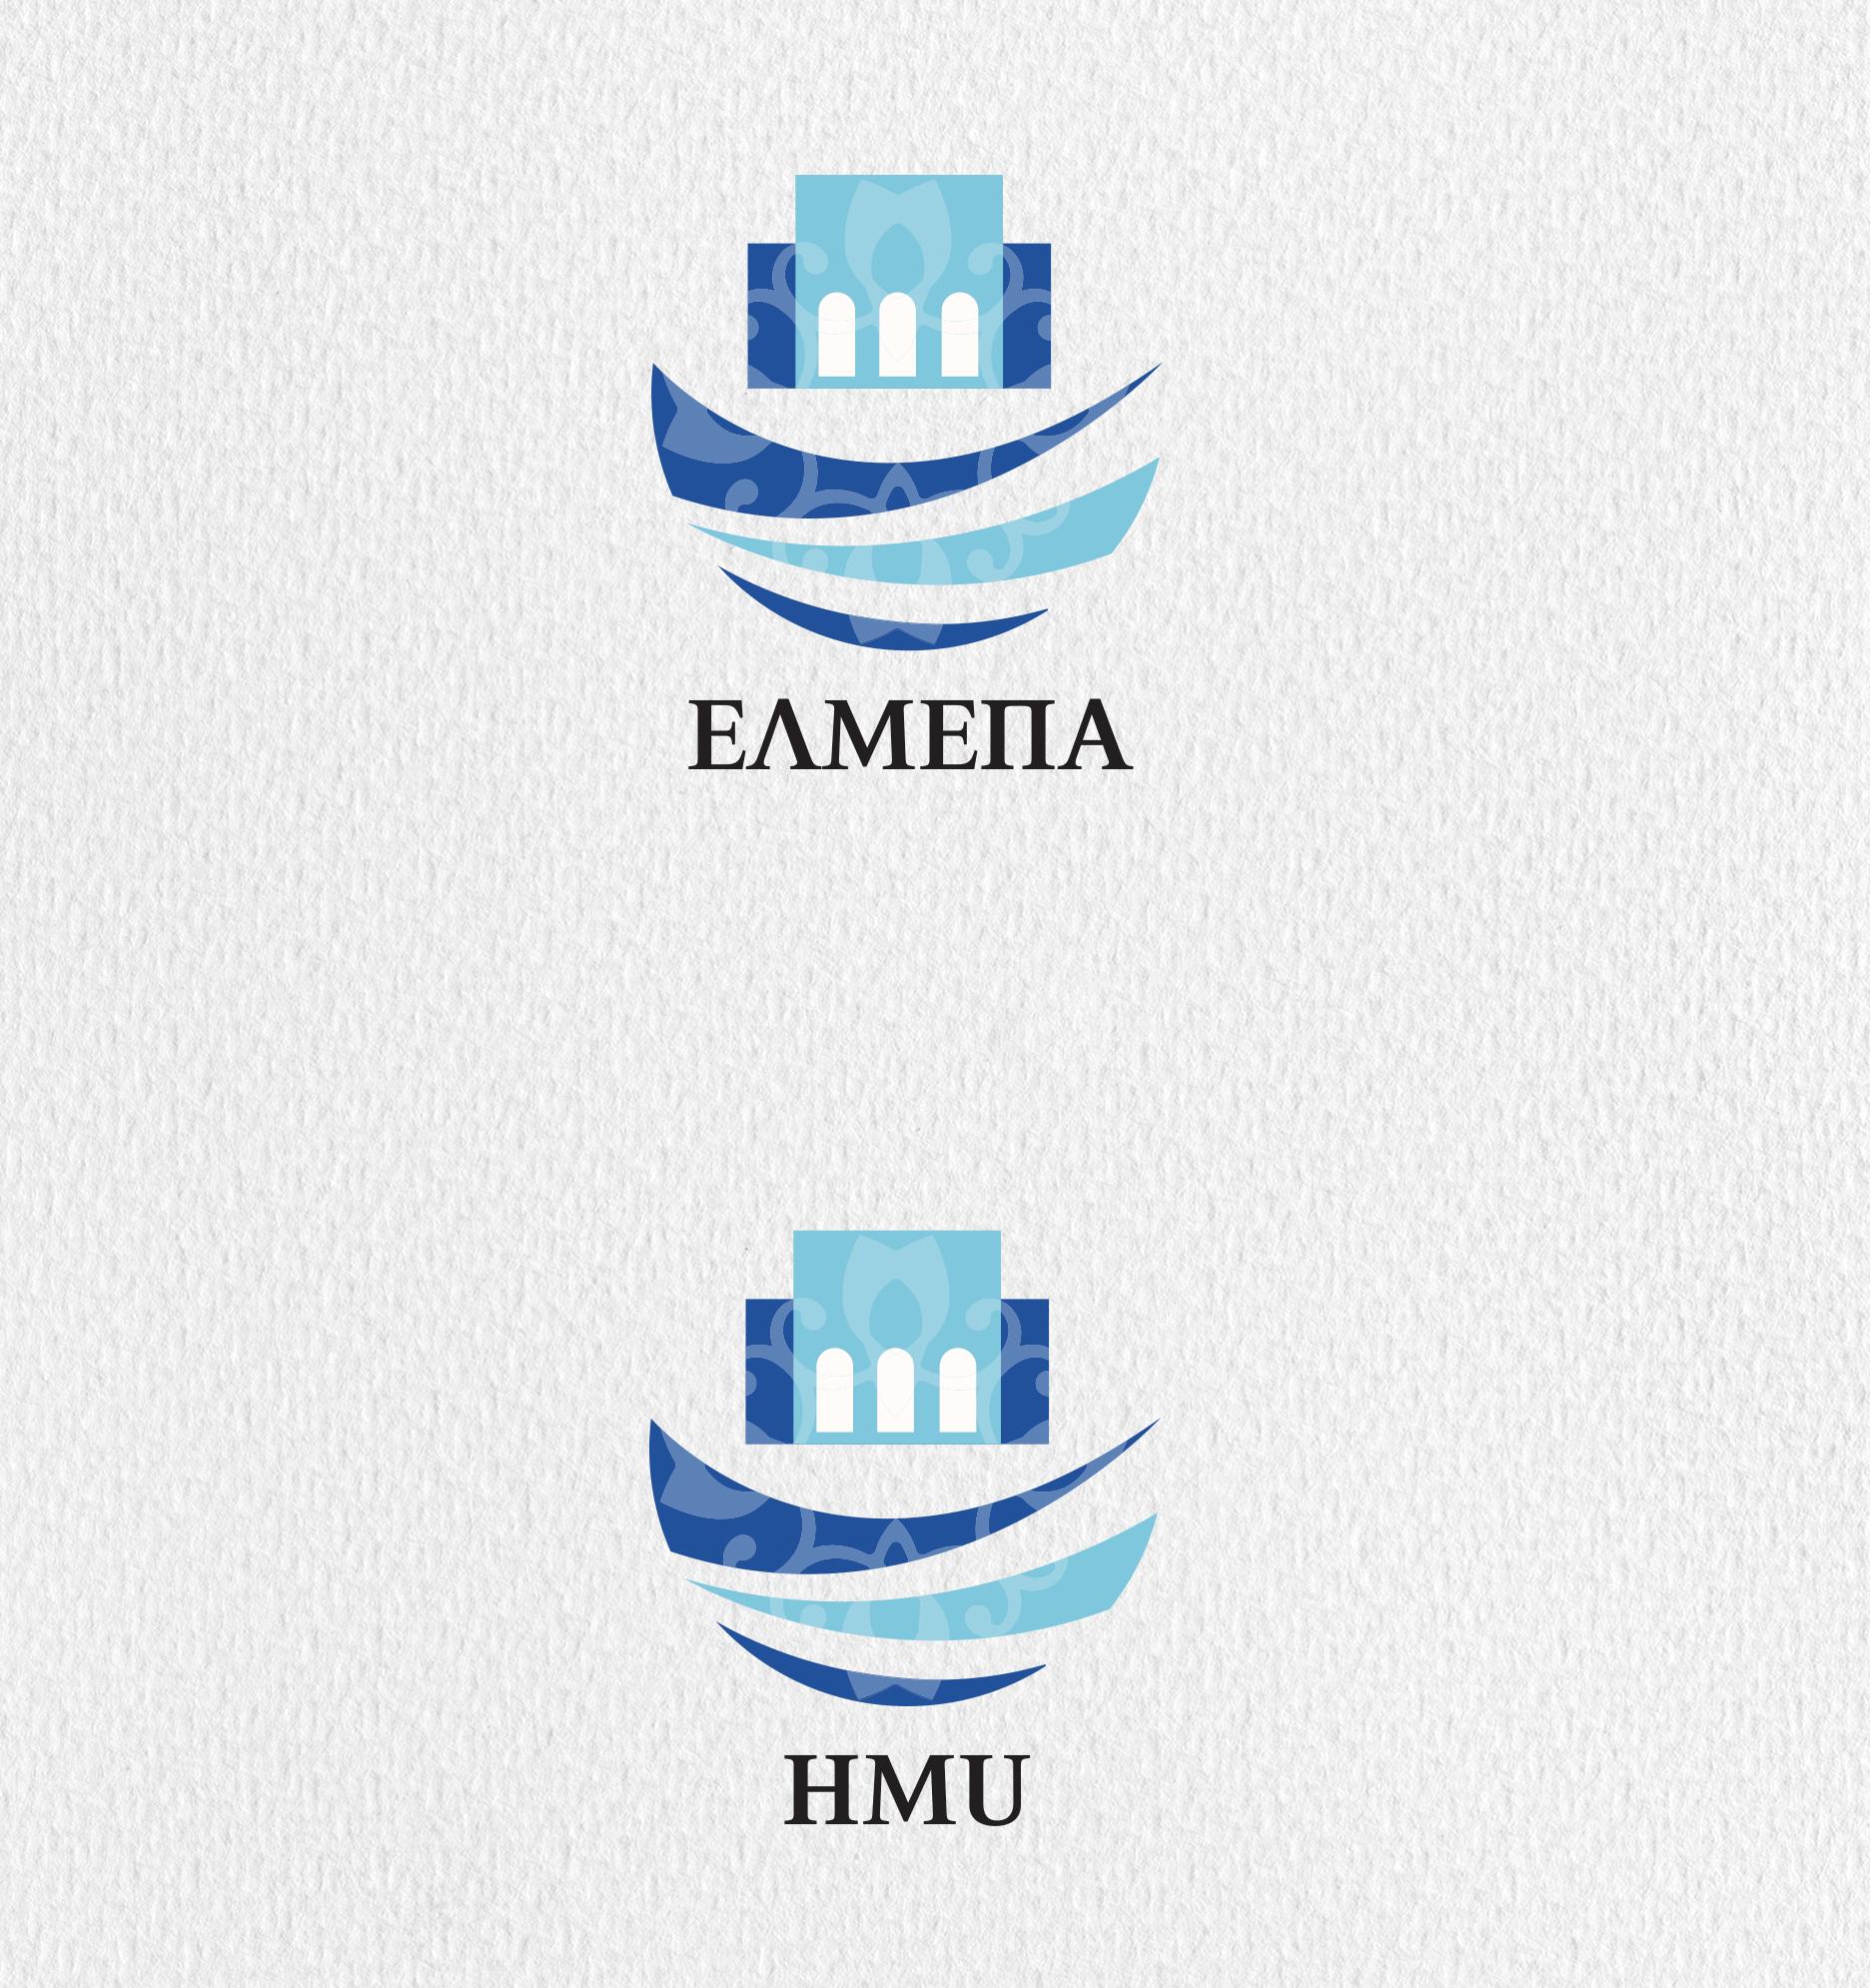 ELMEPA logo greek & english acronyms